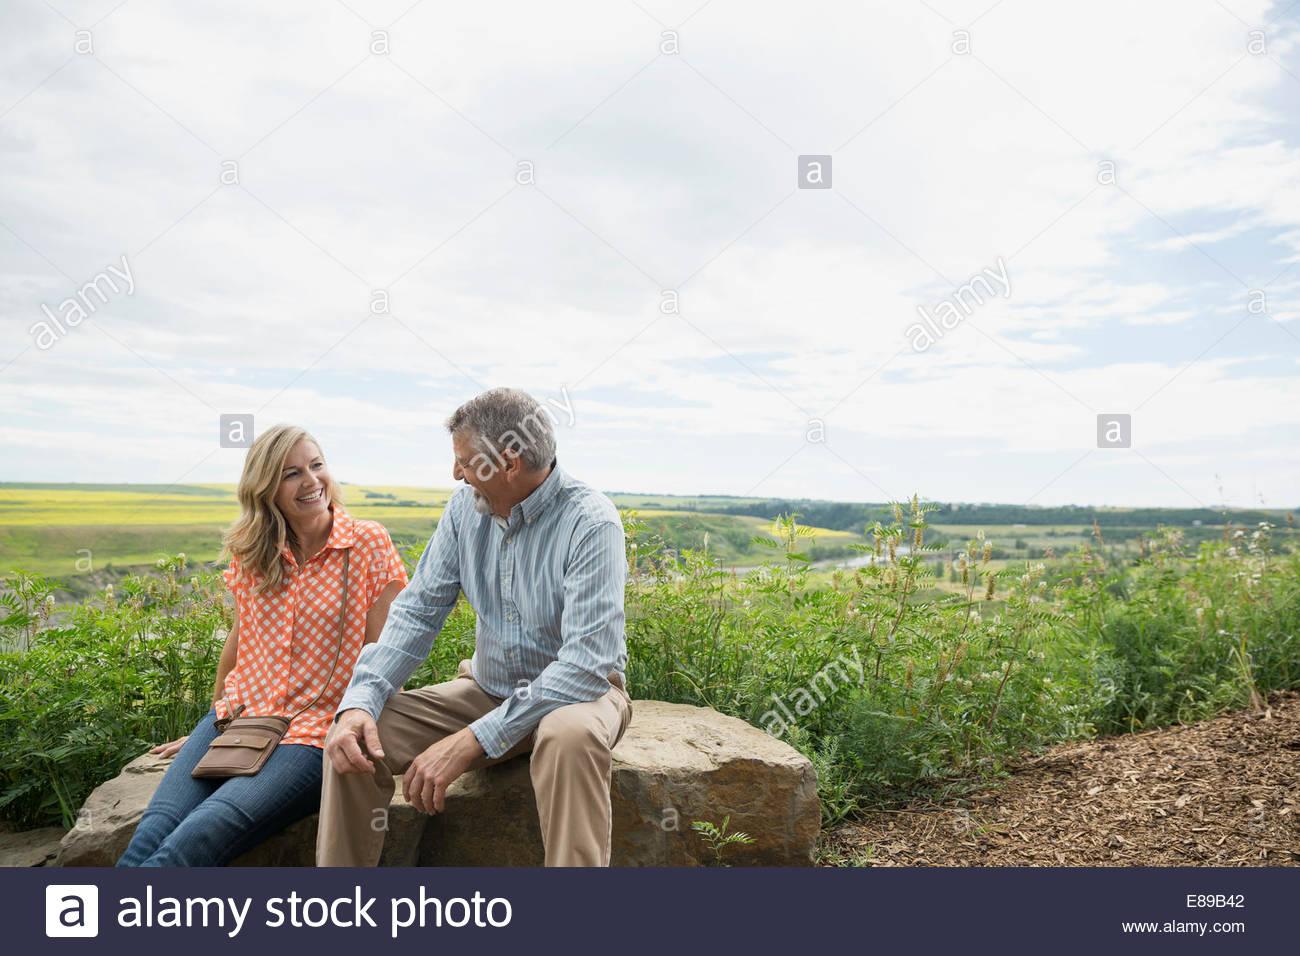 Couple sitting on rock overlooking countryside - Stock Image